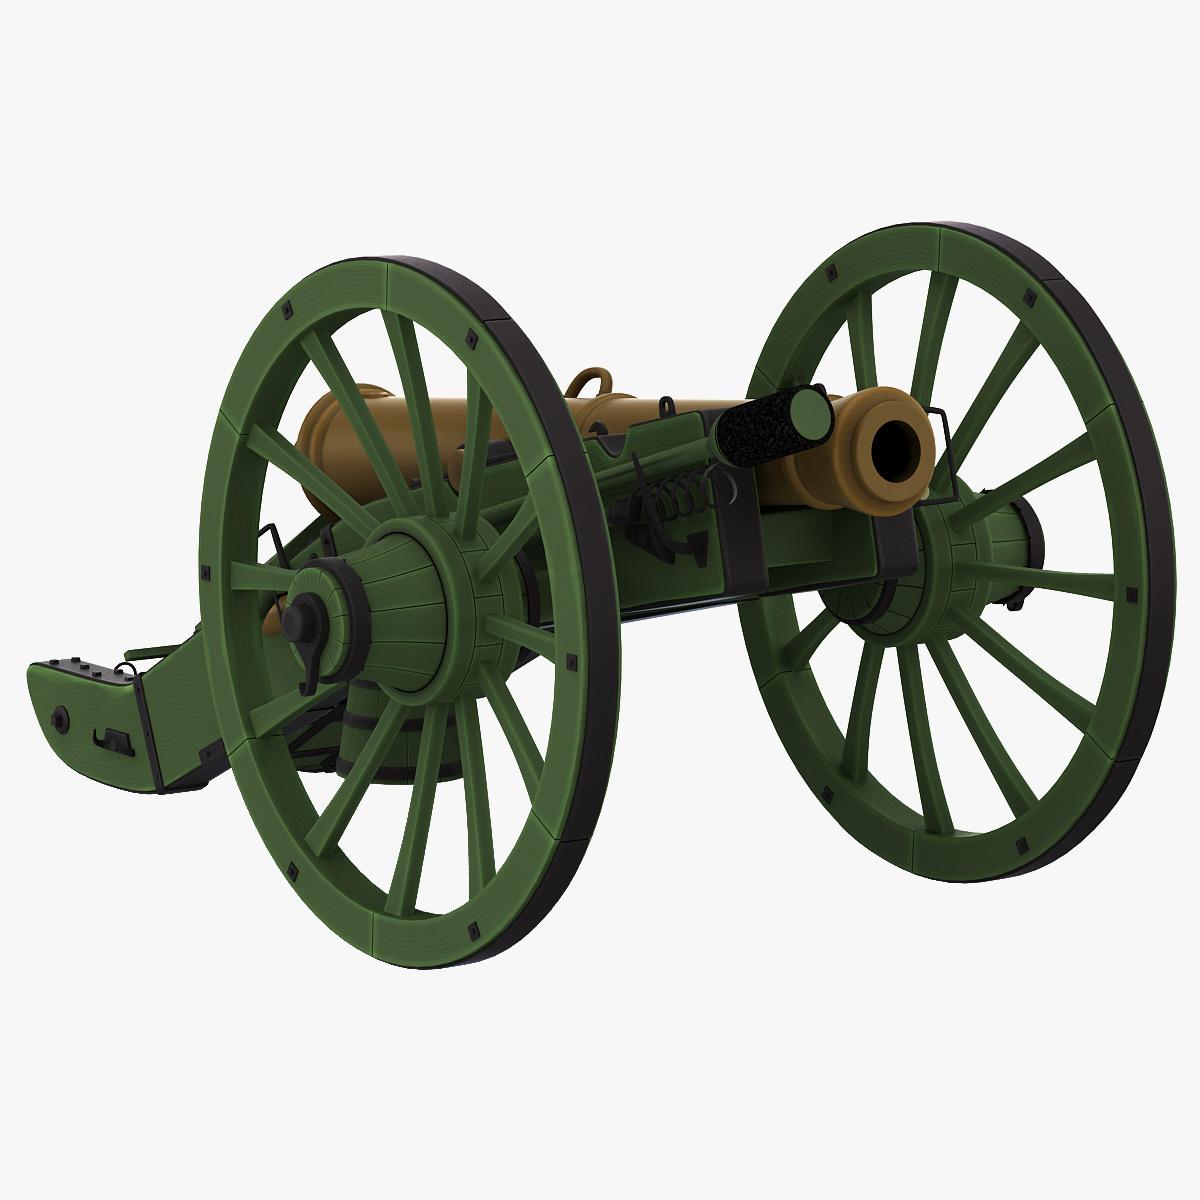 Napoleons_12-pdr_Gribeauval_Field_Gun_Transport_Position_000.jpg